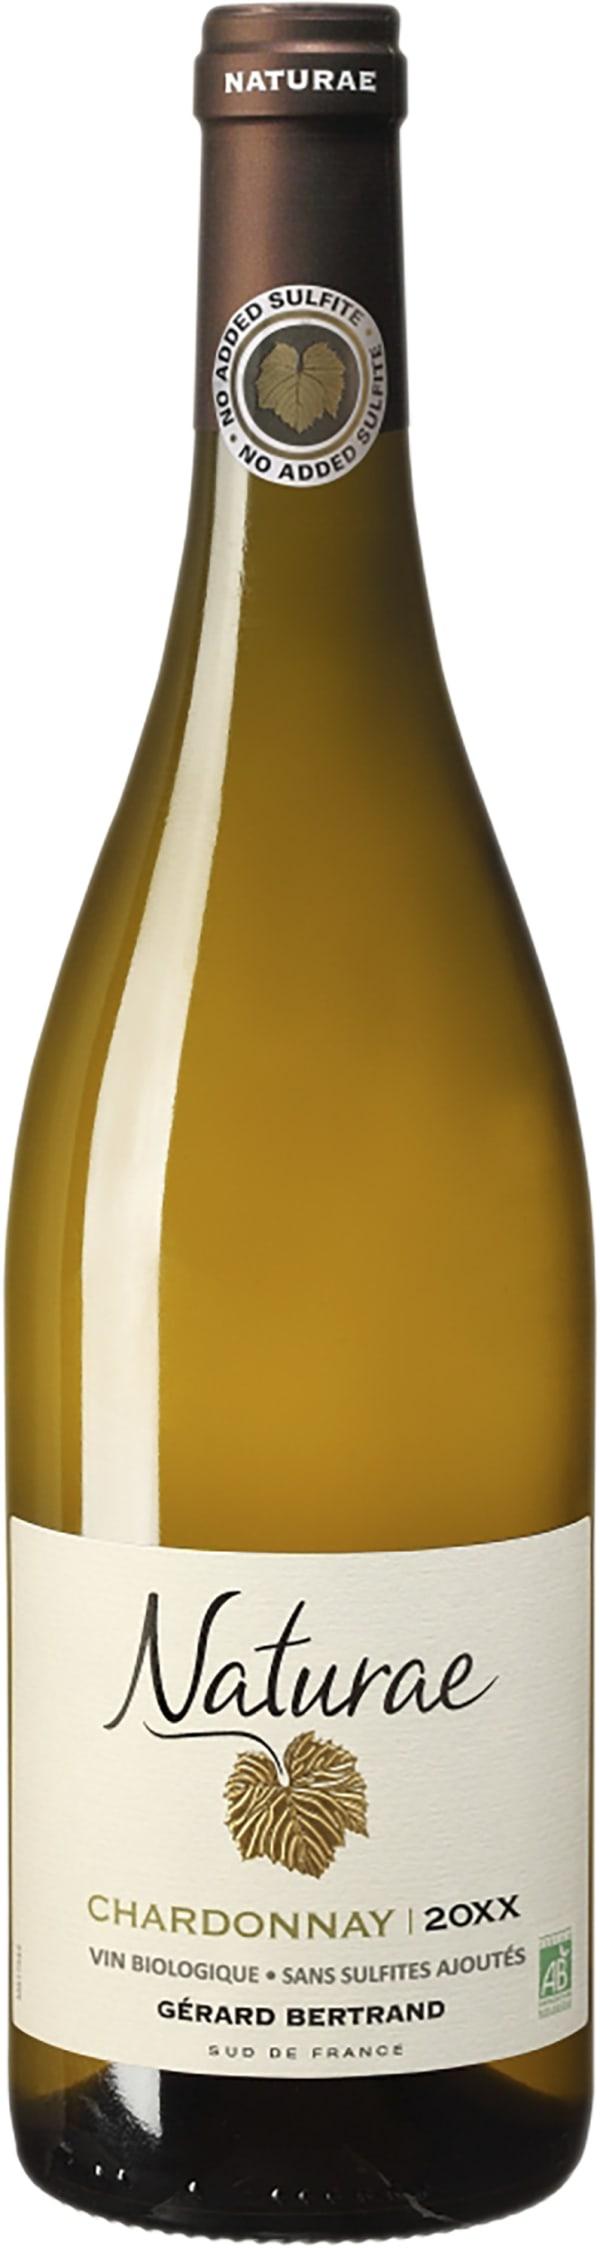 Gérard Bertrand Naturae Organic Chardonnay 2019